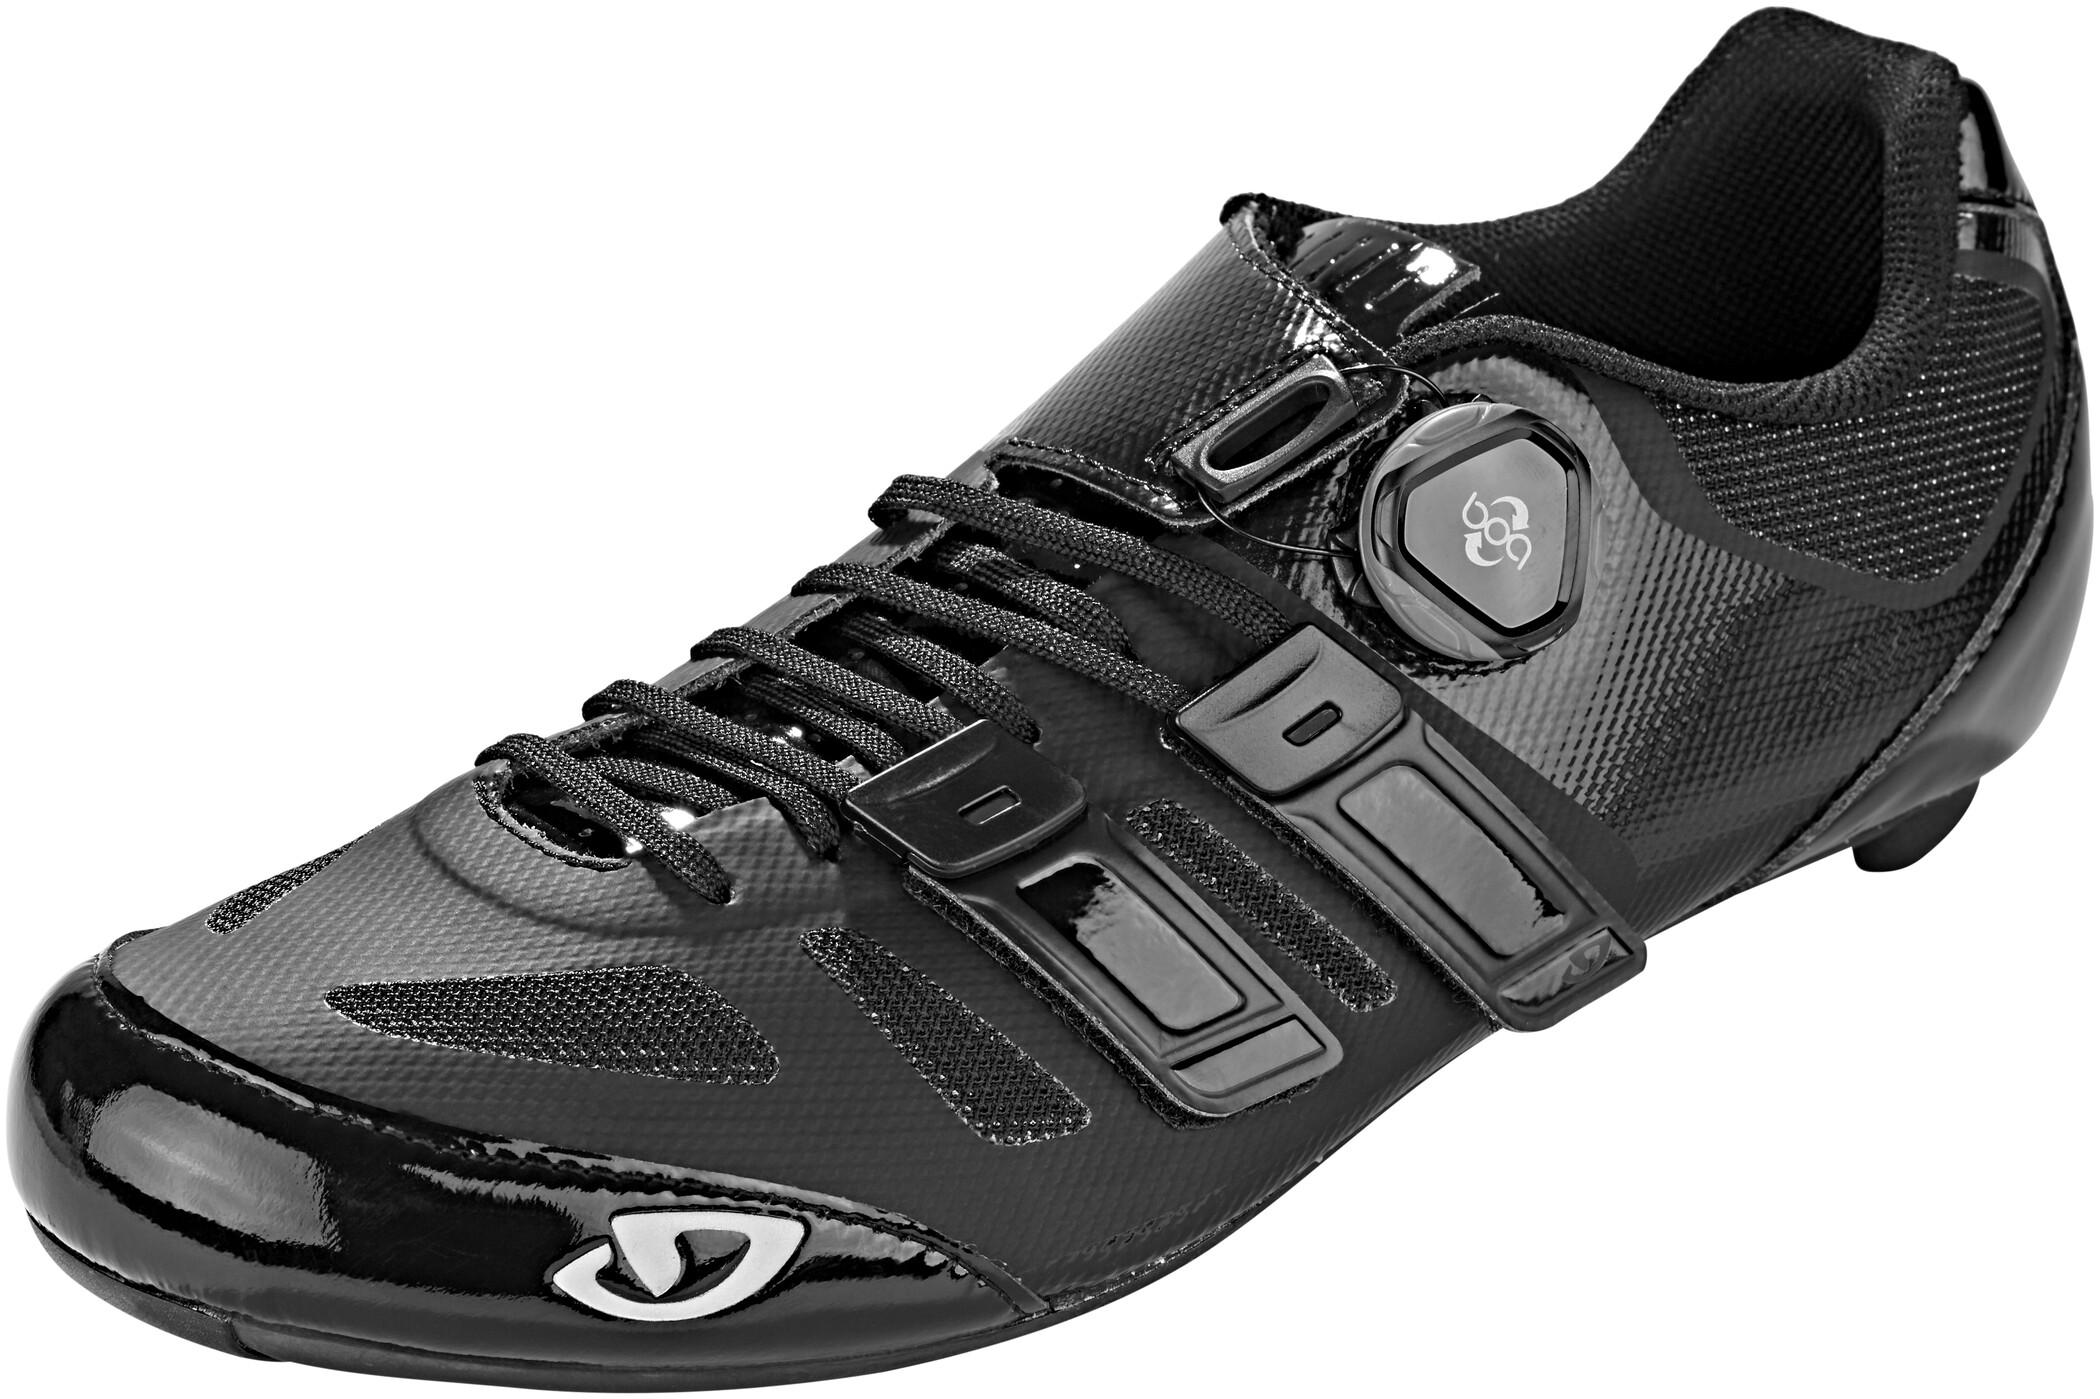 Giro Sentrie Techlace Road Cycling Shoes 2018 | cycling shoes